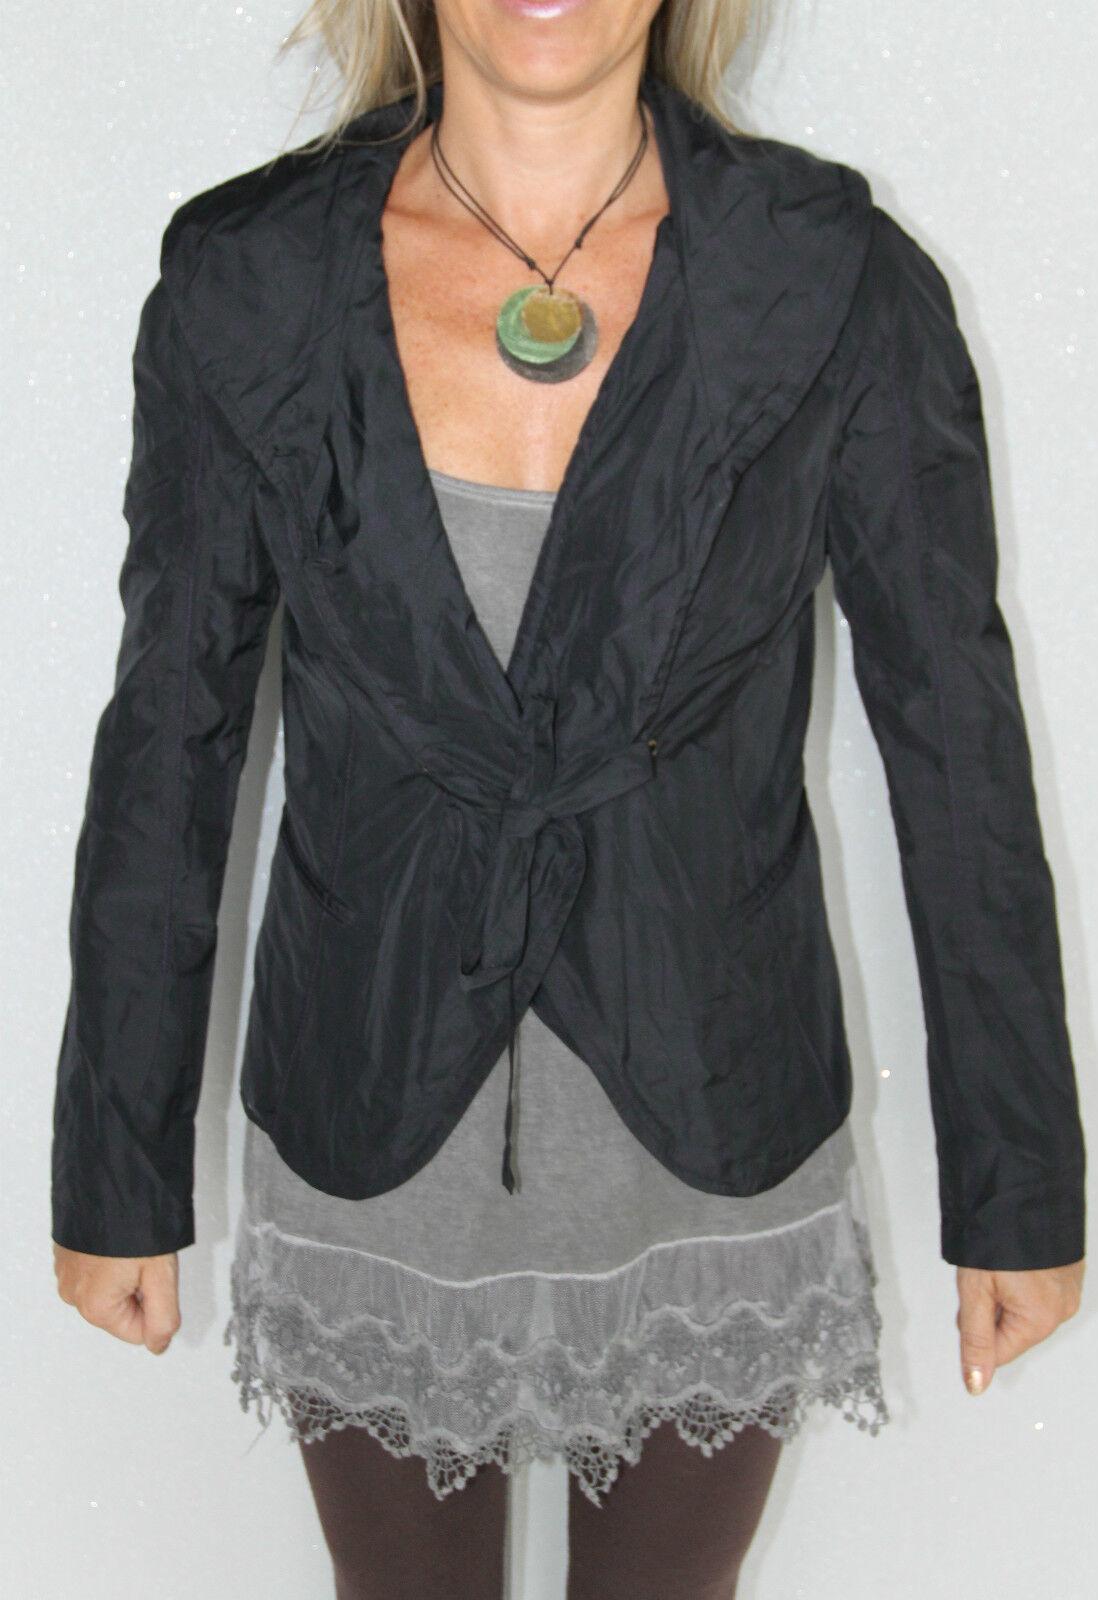 FALKE–Maglia a Intima Underwear Cool a FALKE–Maglia Maniche Lunghe Tight Fit Uomo (l9Q) 33bde3